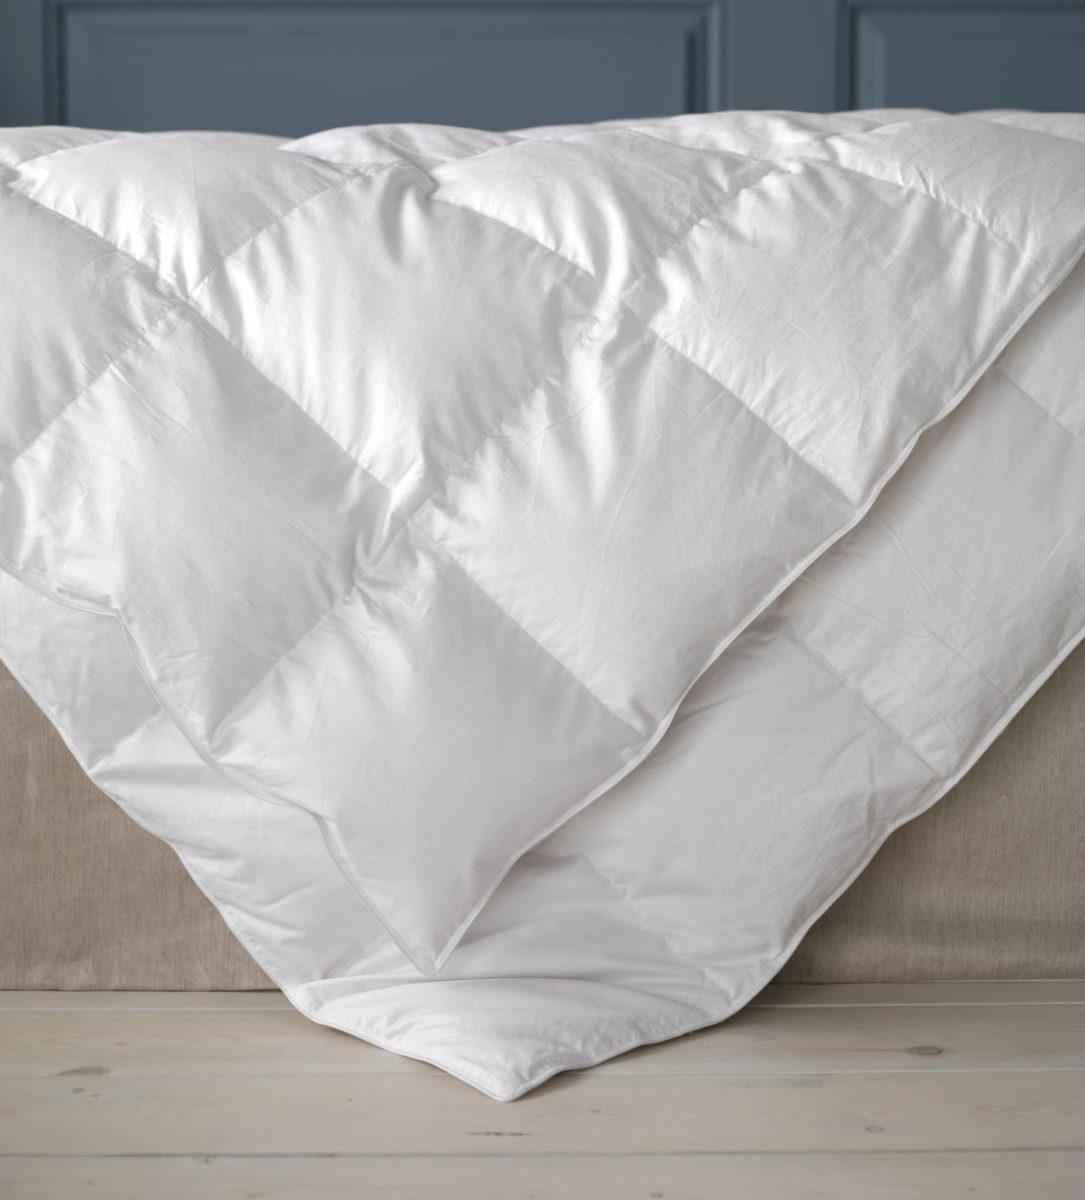 European Goose Down Feather Bedding Secret Linen Store